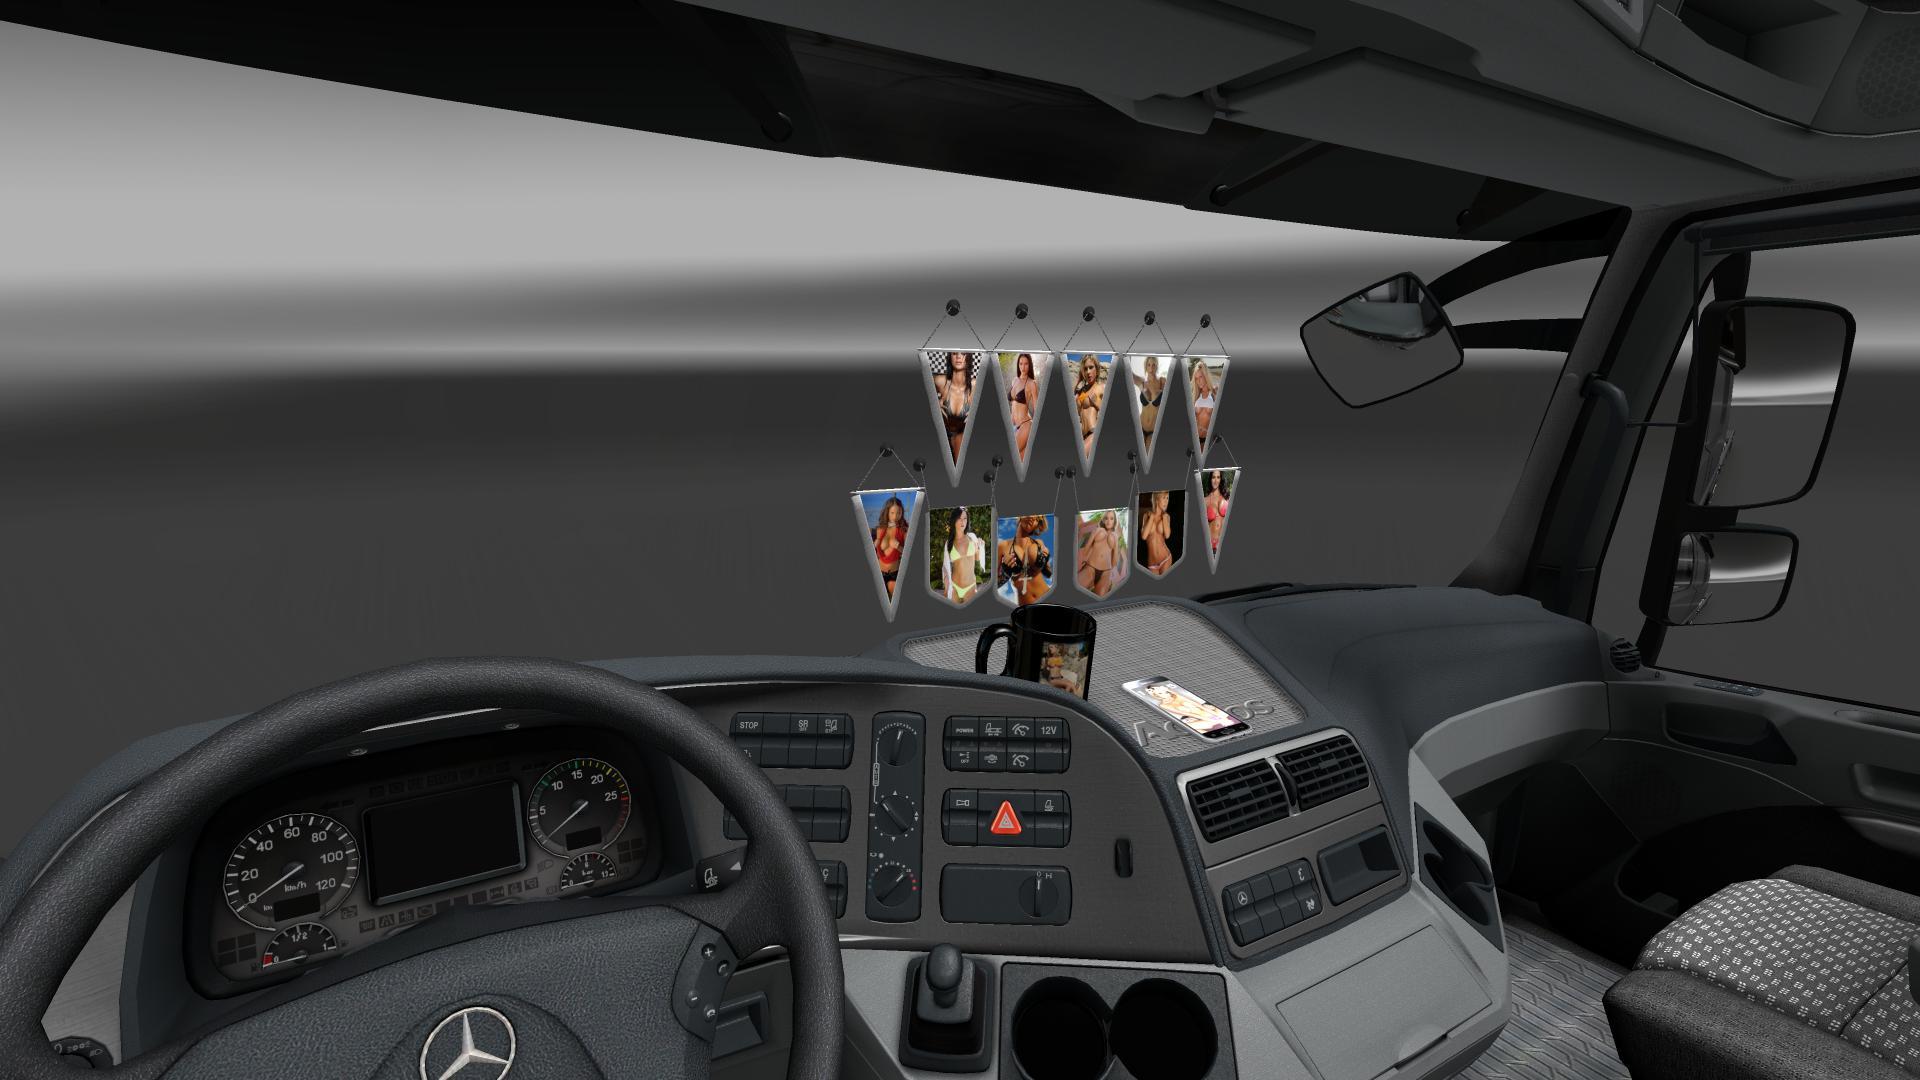 SEXY INTERIOR ELEMENTS V1.0 ETS 2 -Euro Truck Simulator 2 Mods Scania Trucks Interior